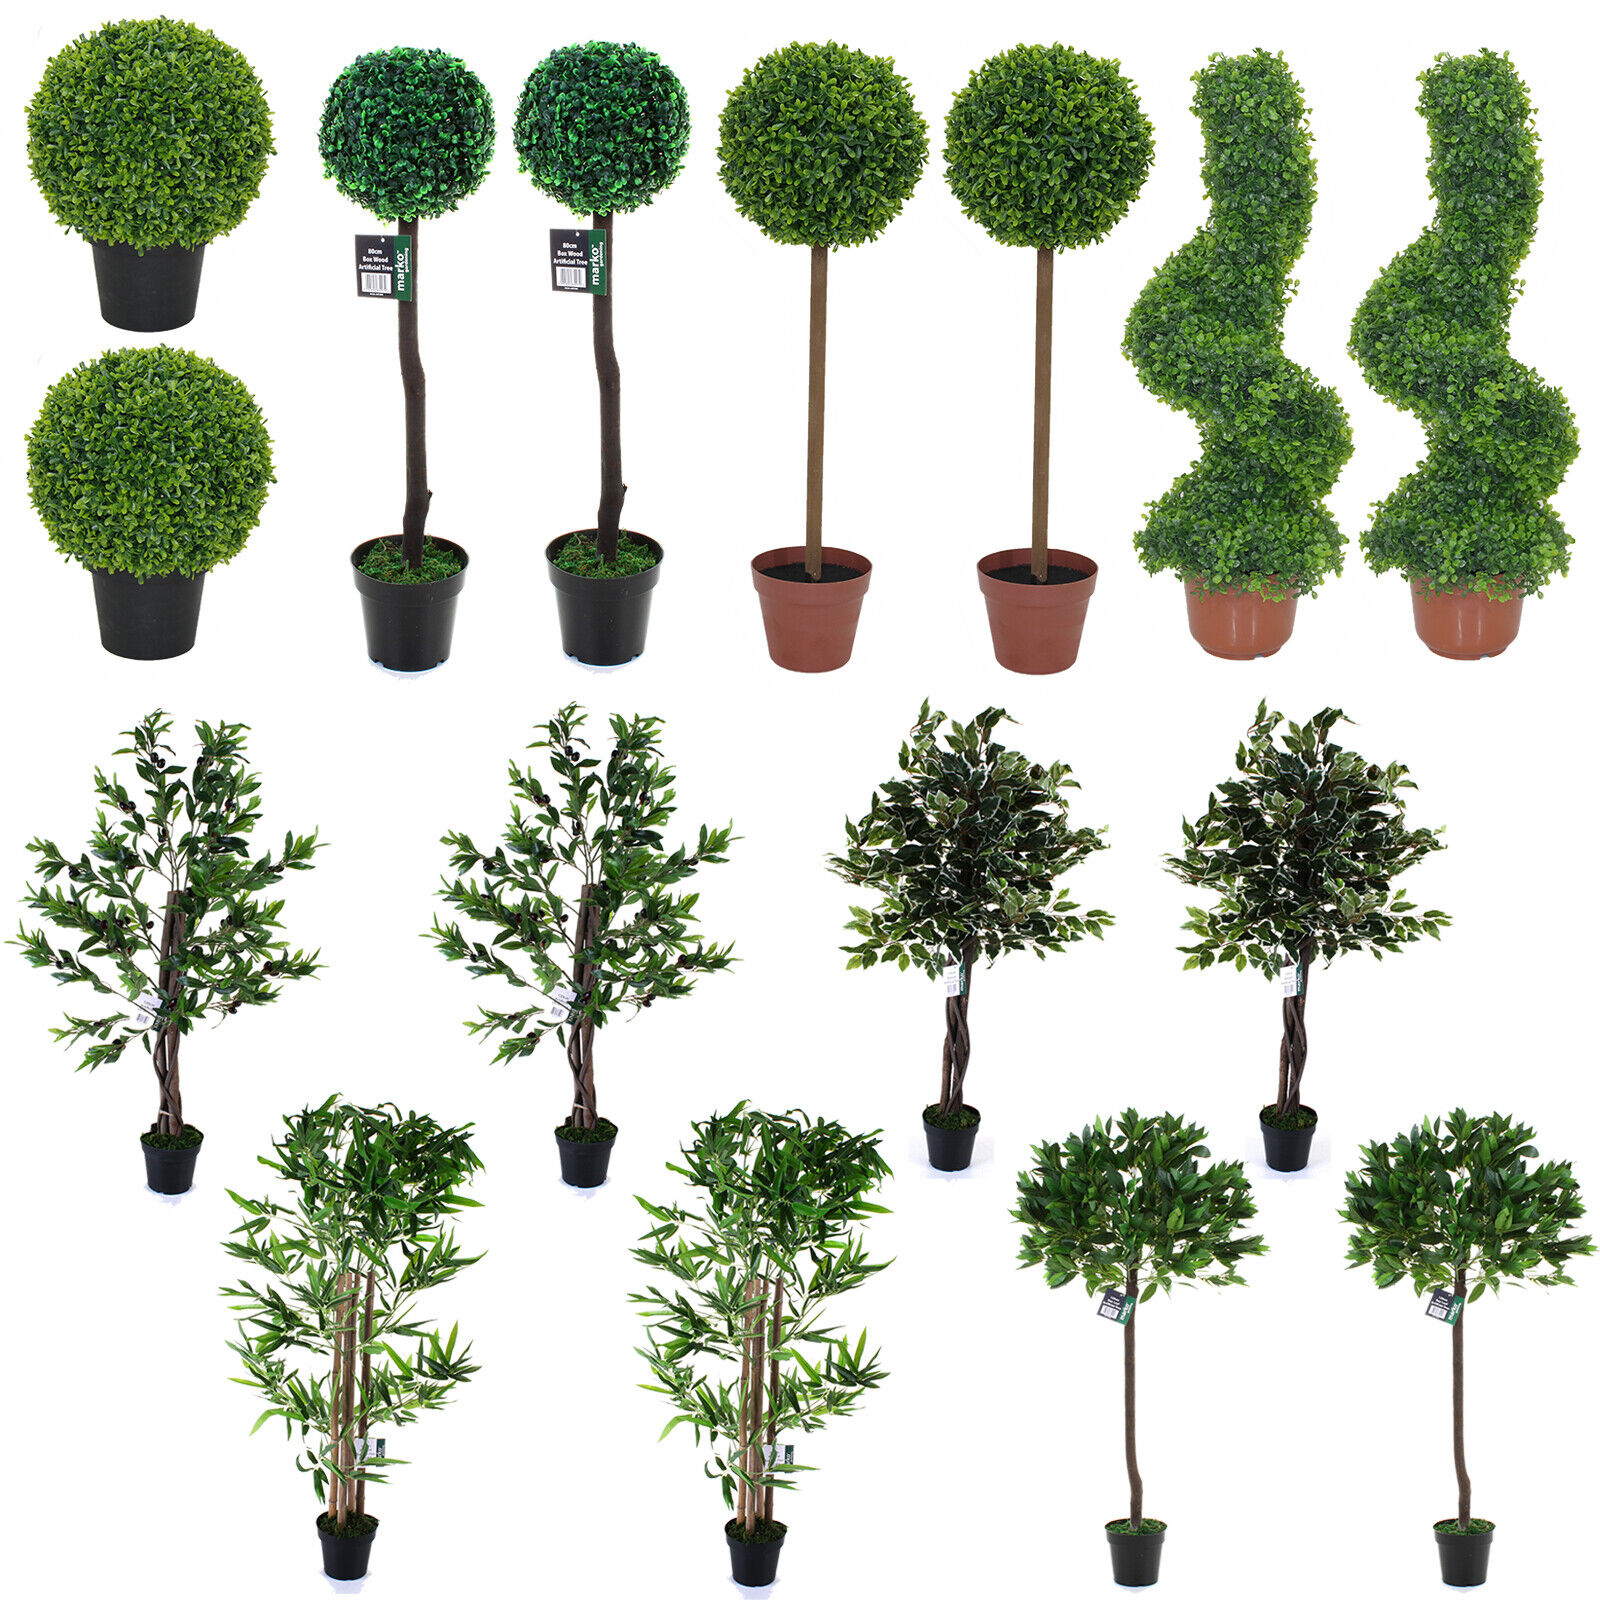 TOPIARY TREES ARTIFICIAL TREE 8 DESIGNS INDOOR   OUTDOOR GARDEN WEDDING AISLE